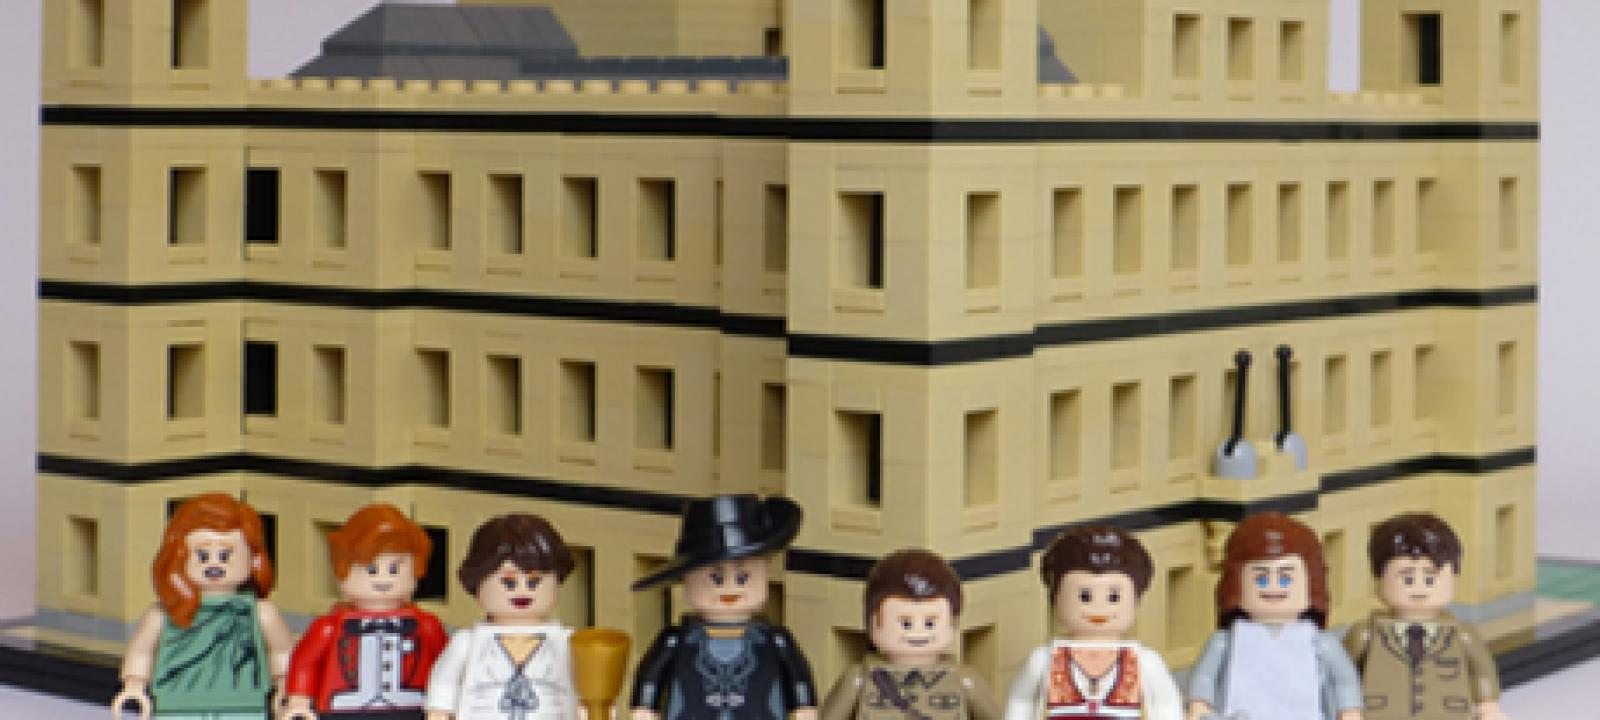 Downton Abbey, Lego